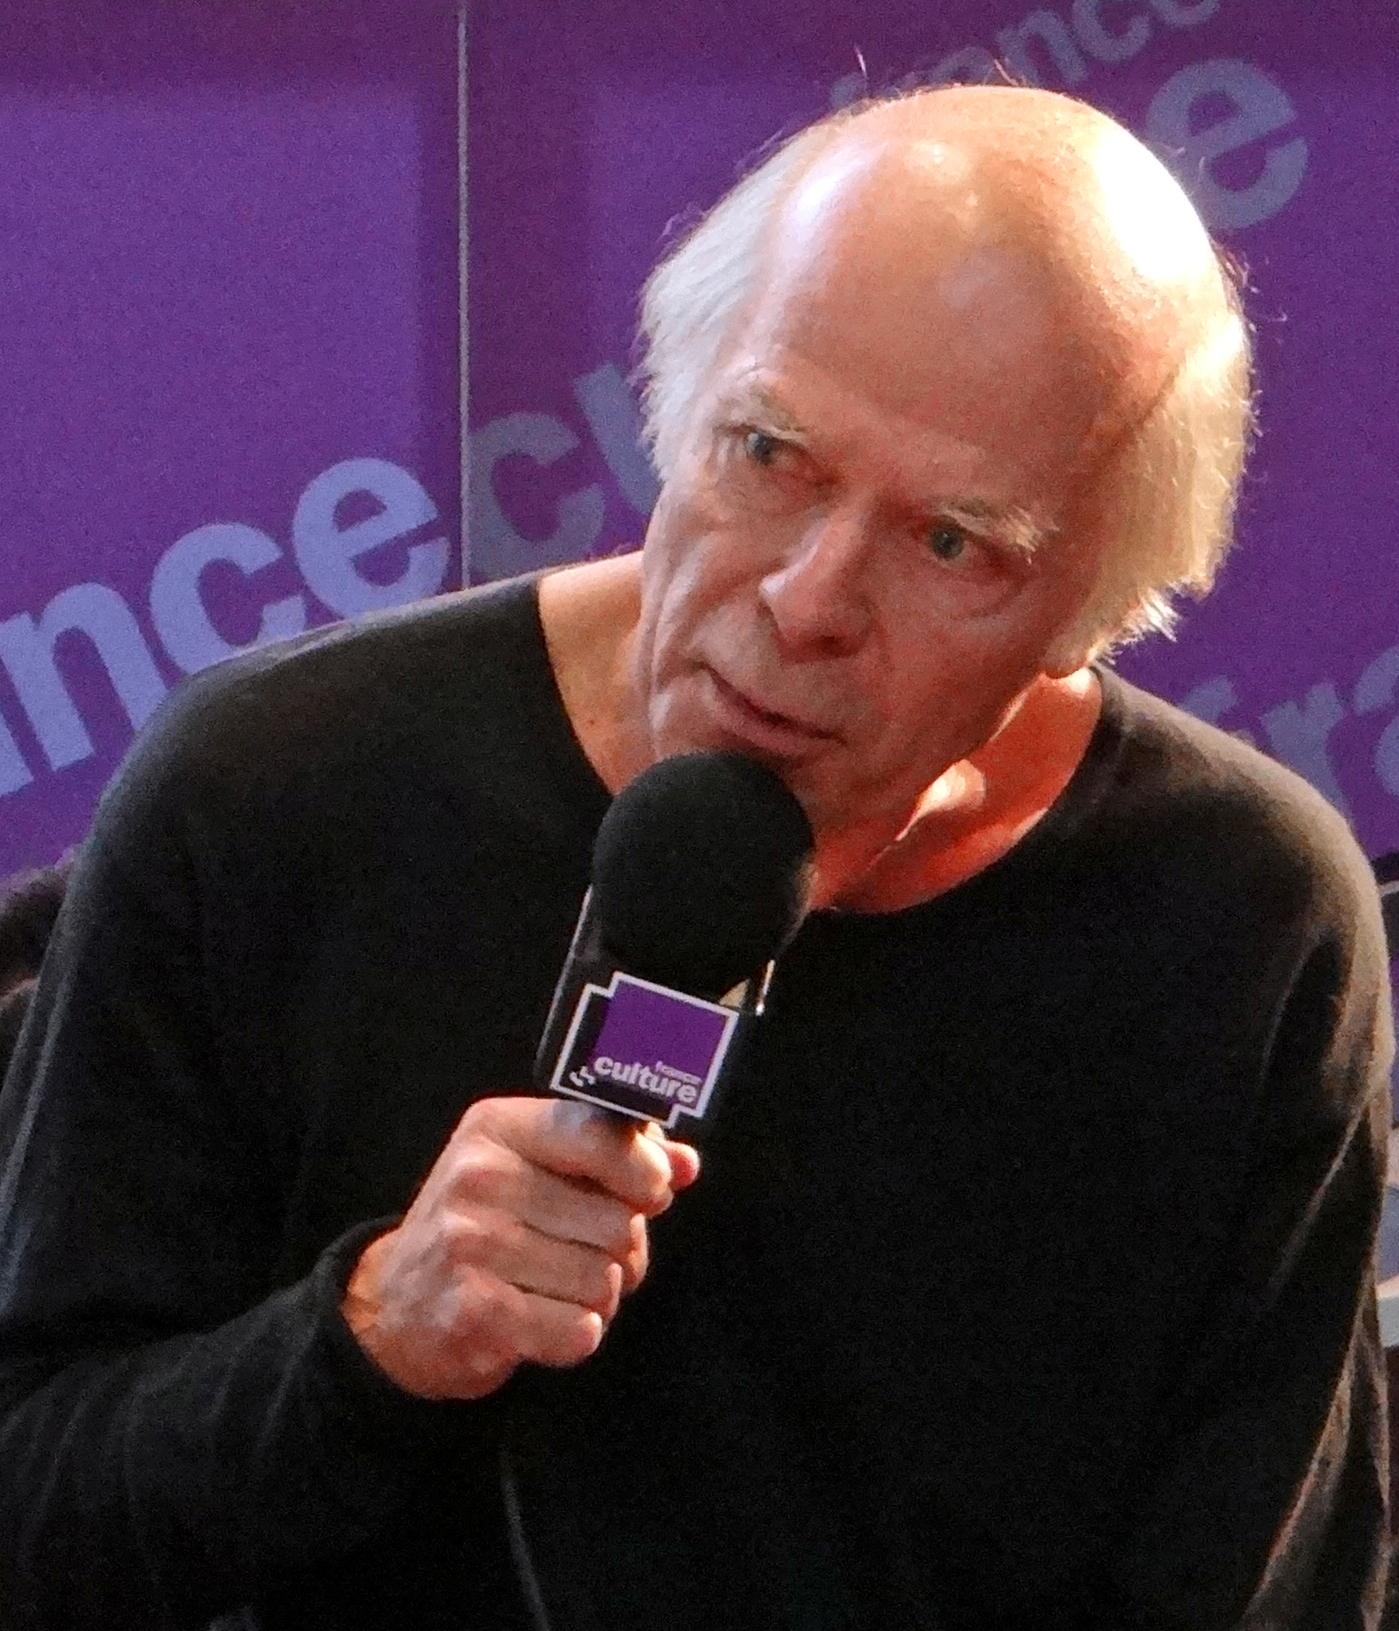 Pascal Quignard Wikiquote Le Recueil De Citations Libres